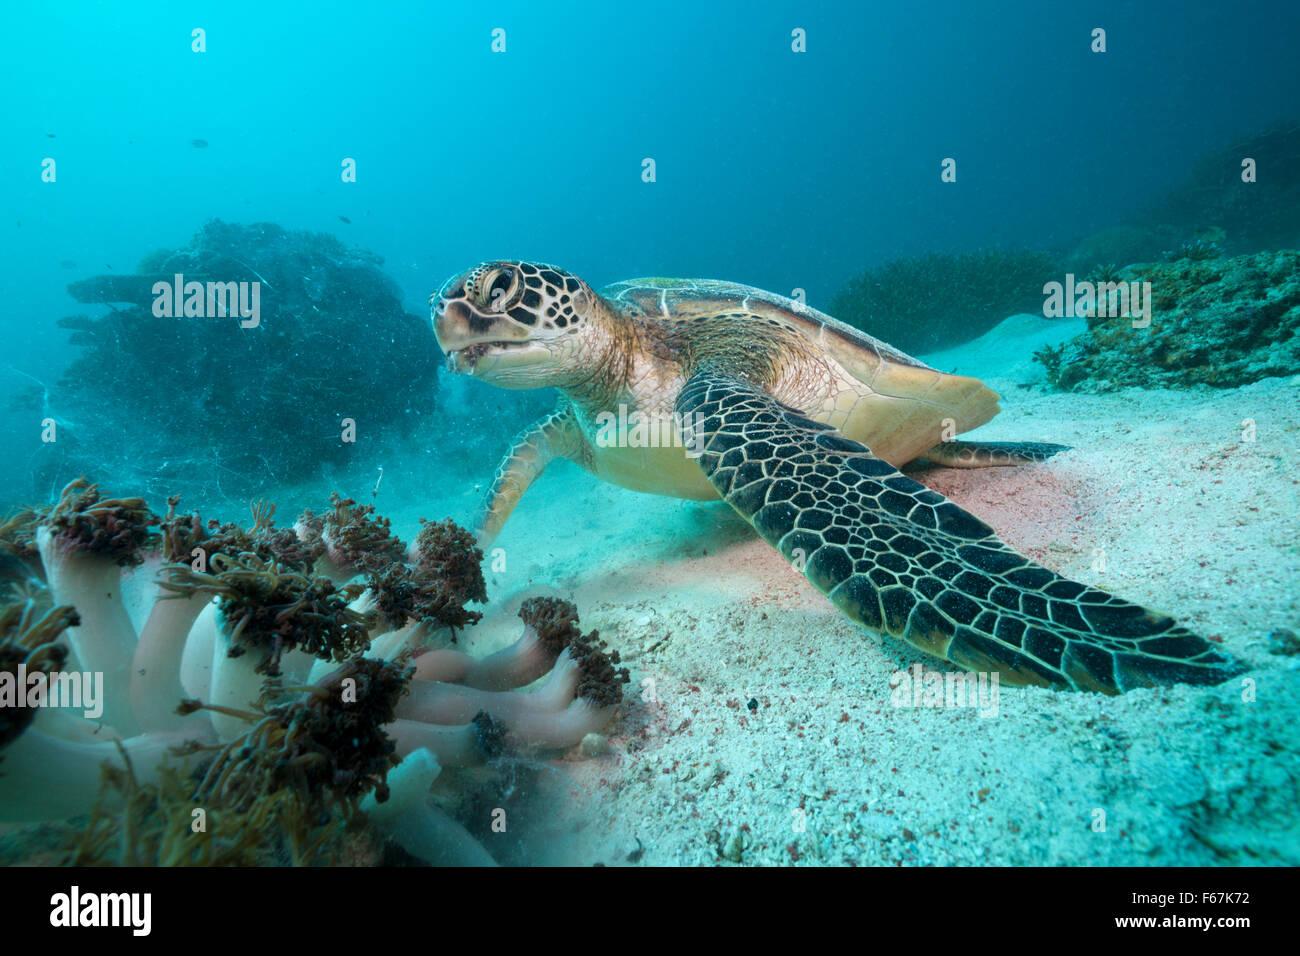 Green Sea Turtle, Chelonia mydas, Komodo National Park, Indonesia - Stock Image